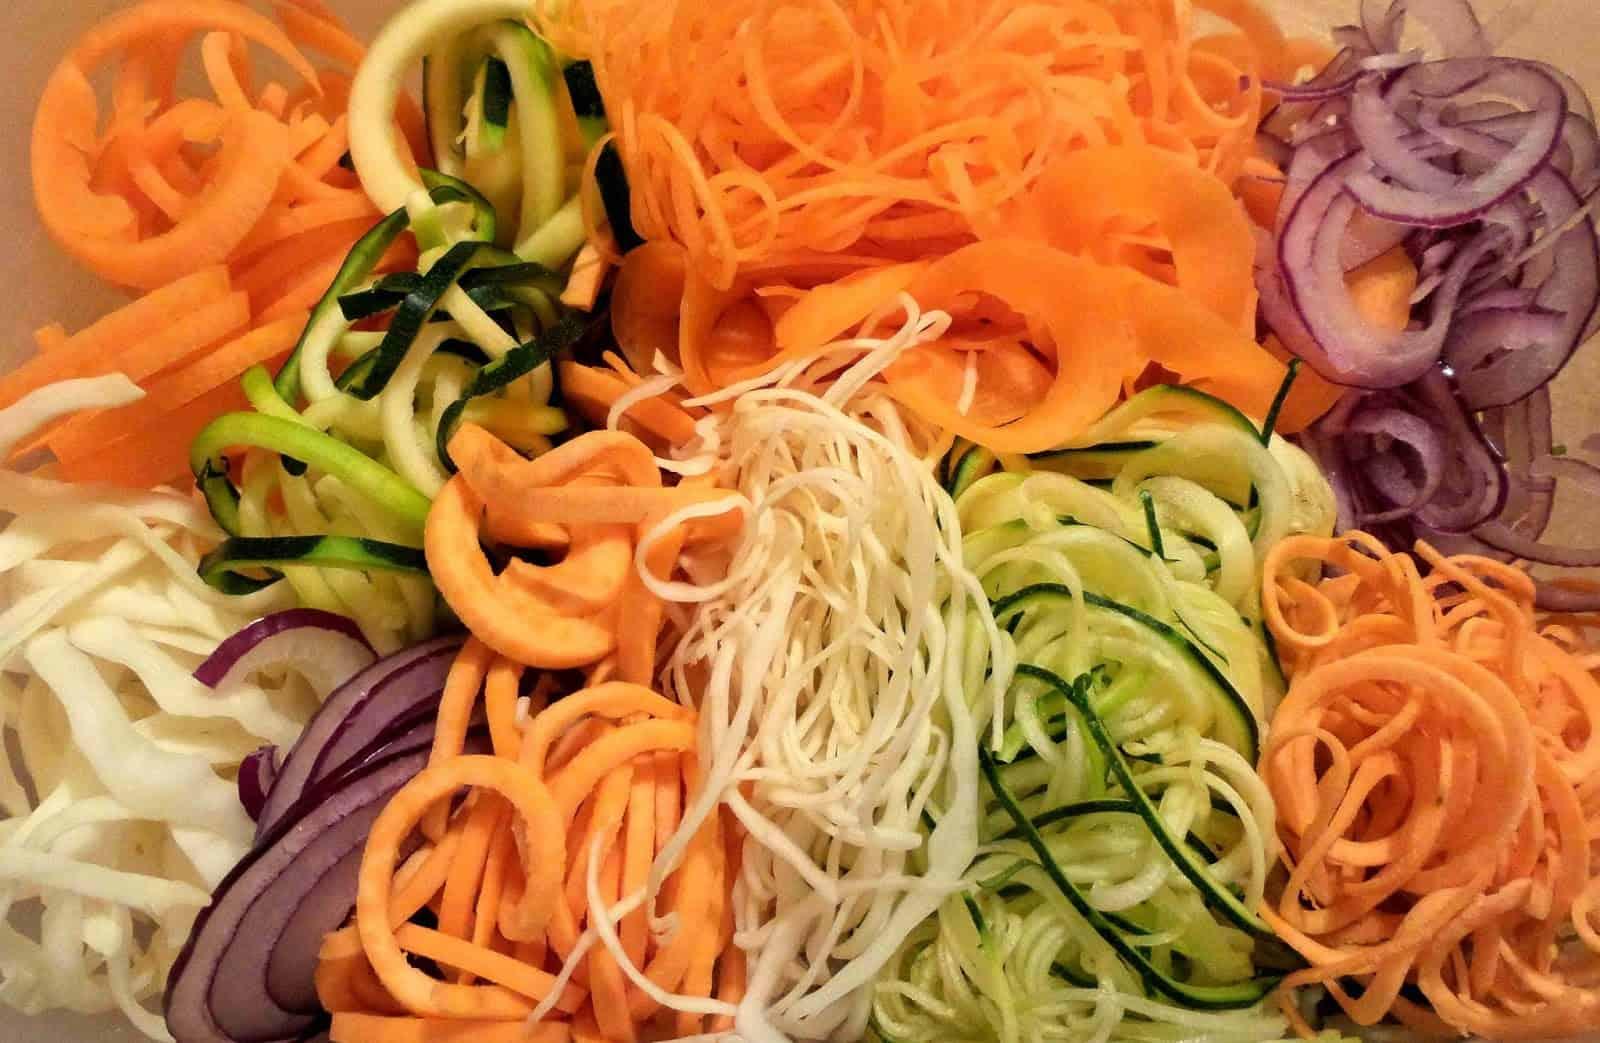 A bunch of spiralized veggies.